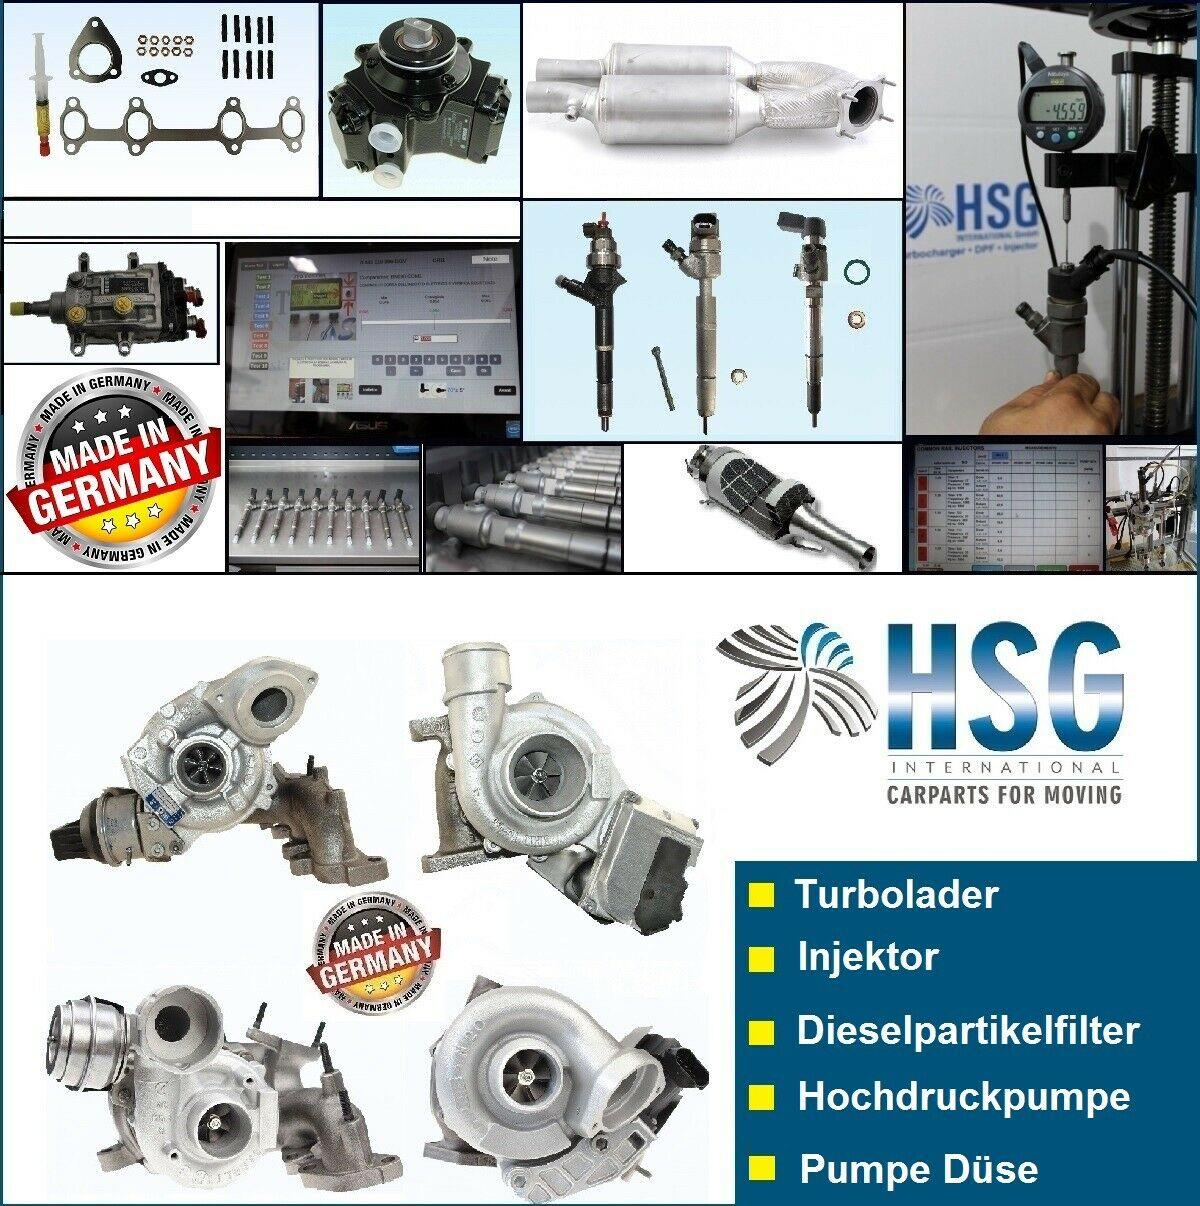 HSG International.jpg